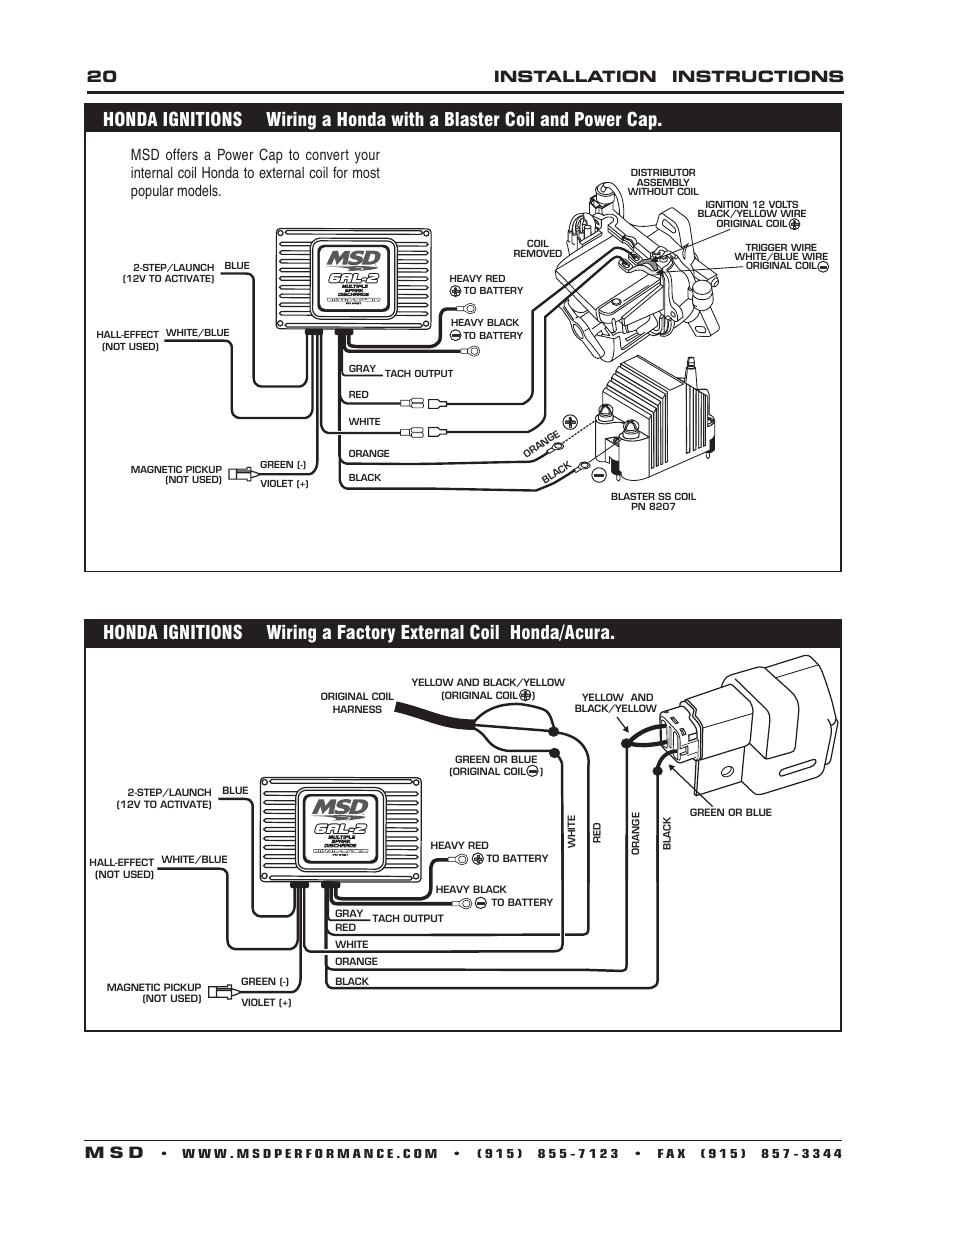 msd 6421 6al 2 ignition control installation page20?resize\\\\=665%2C861 diagrams 753437 msd 6al wiring diagram 6al msd ignition wiring msd 6a wiring diagram for jeep 258 at soozxer.org